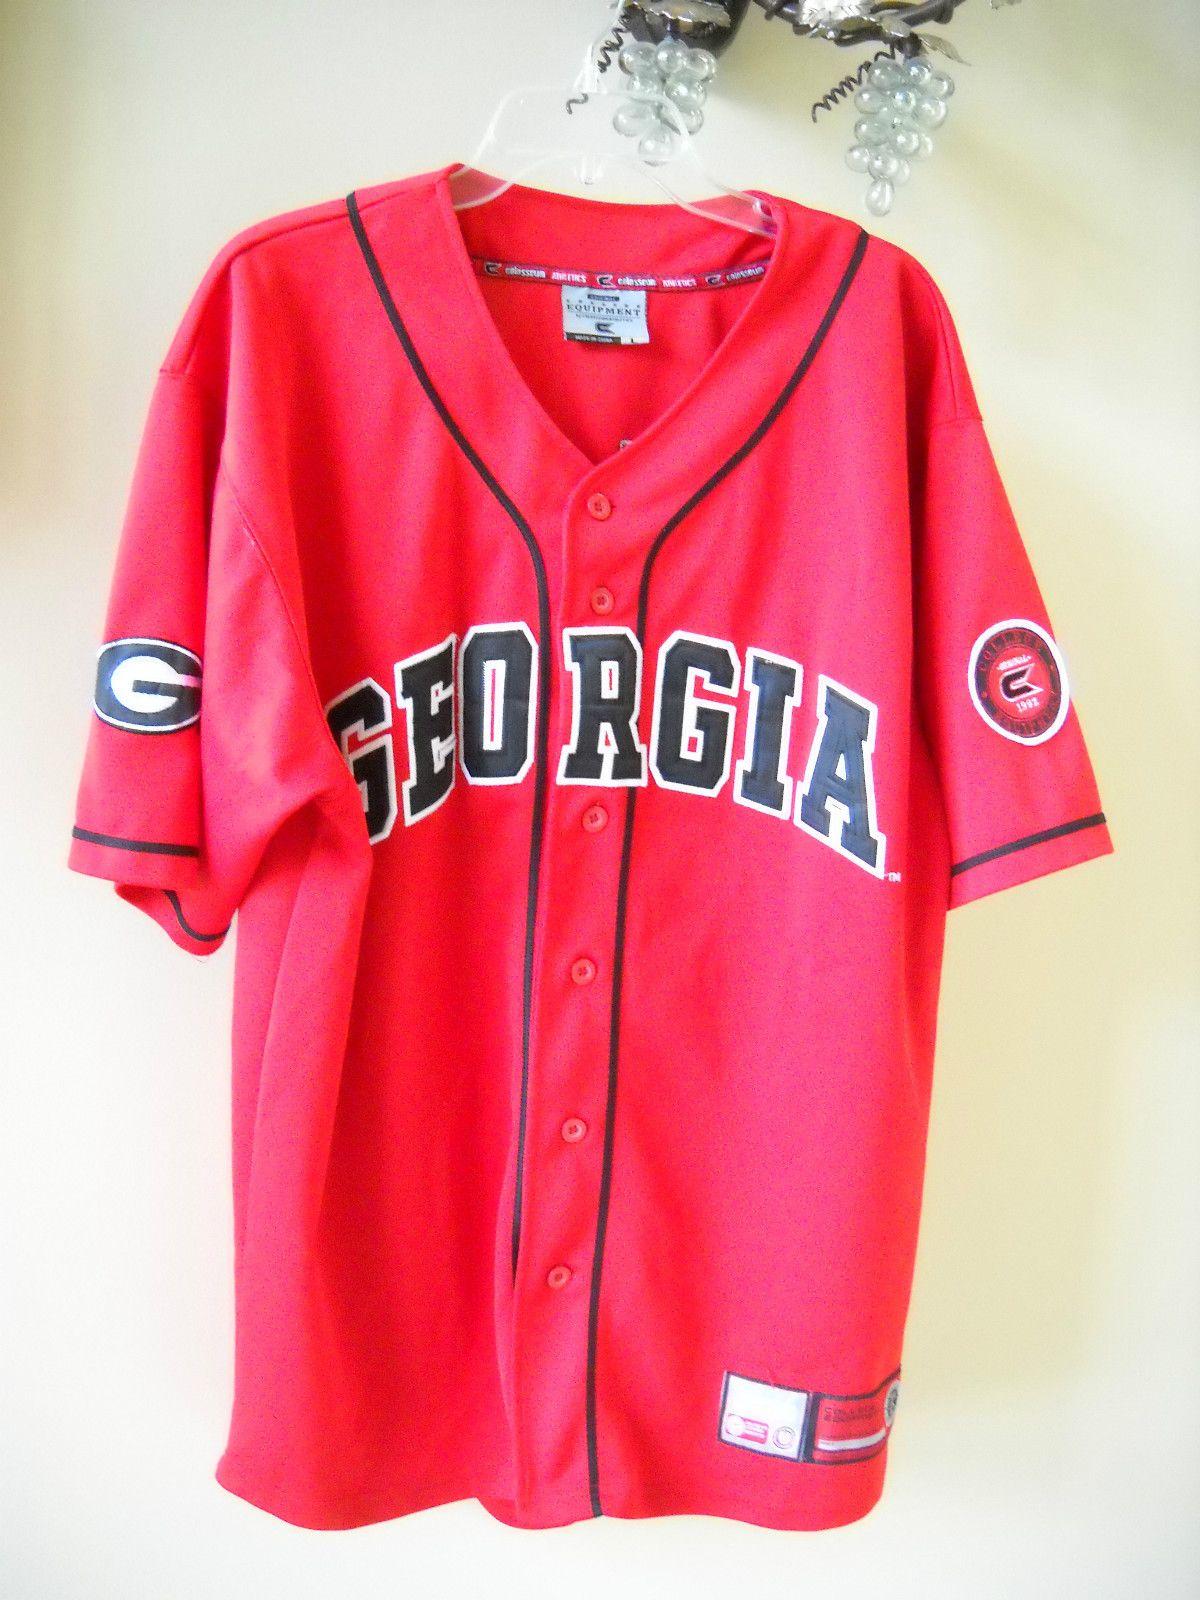 UGA Georgia Bulldogs  33 College Equilpment Colossium Athletics Baseball  Jersey  34baca4f2